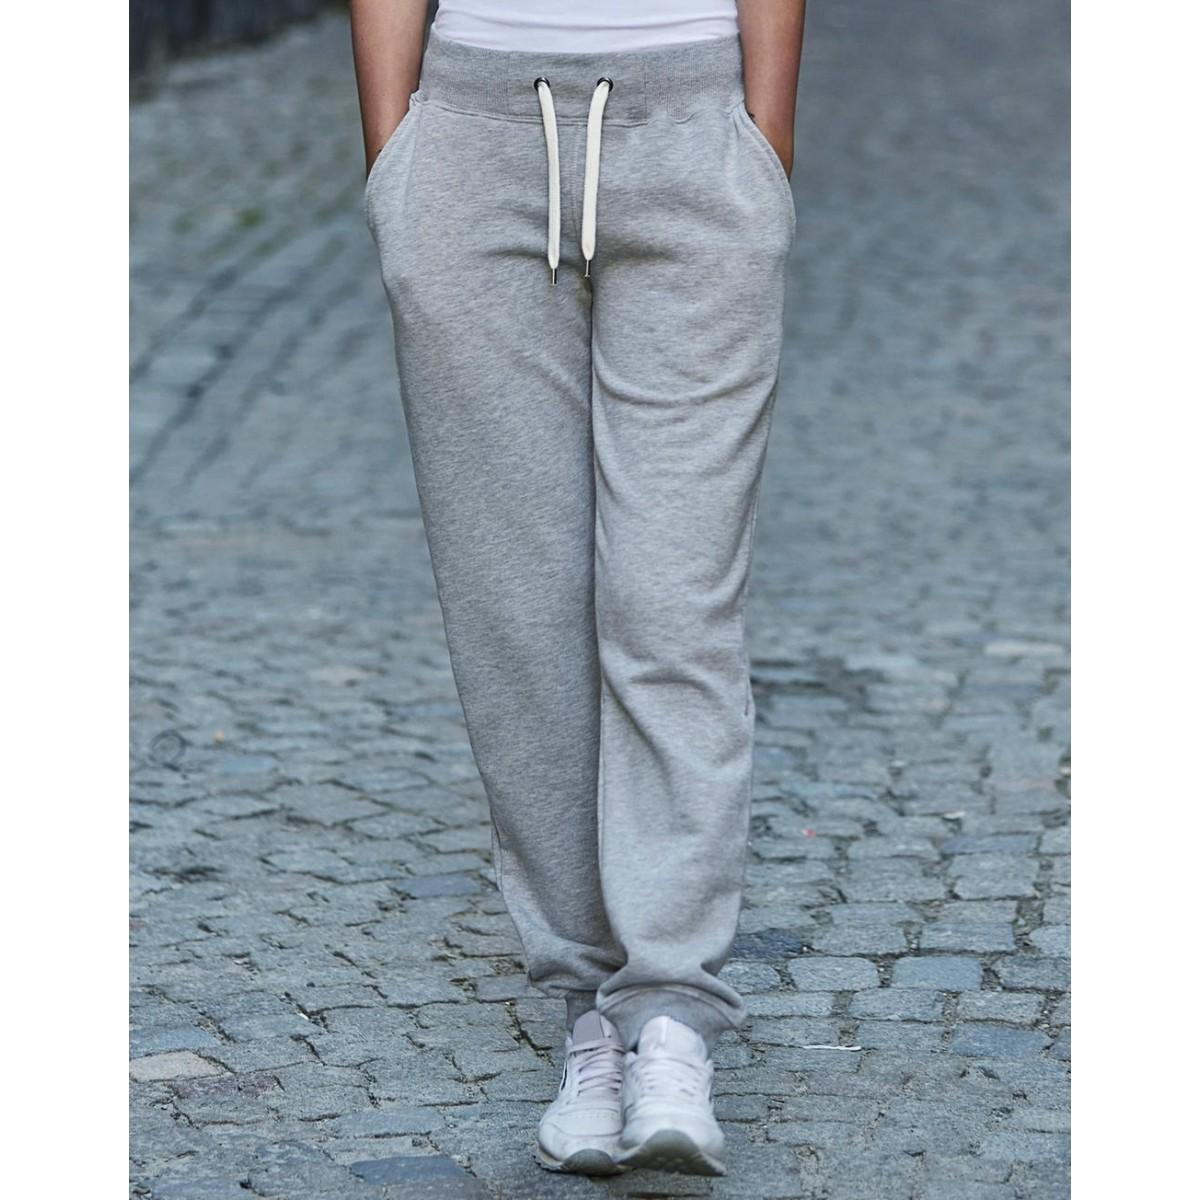 Urban Pants